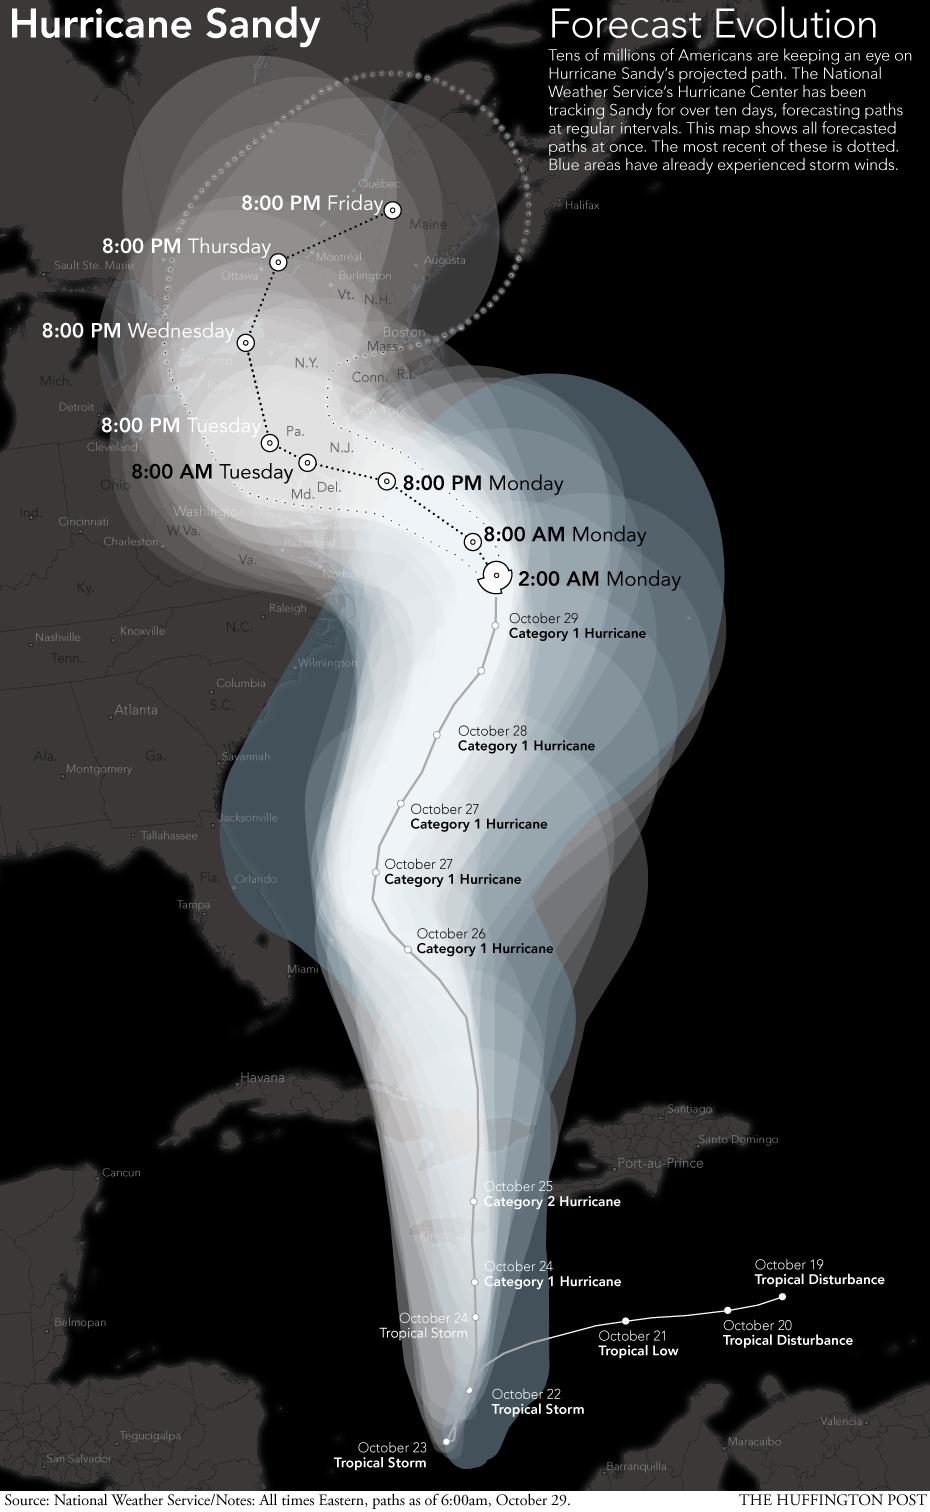 hurricane-sandy-forecast-evolution-map